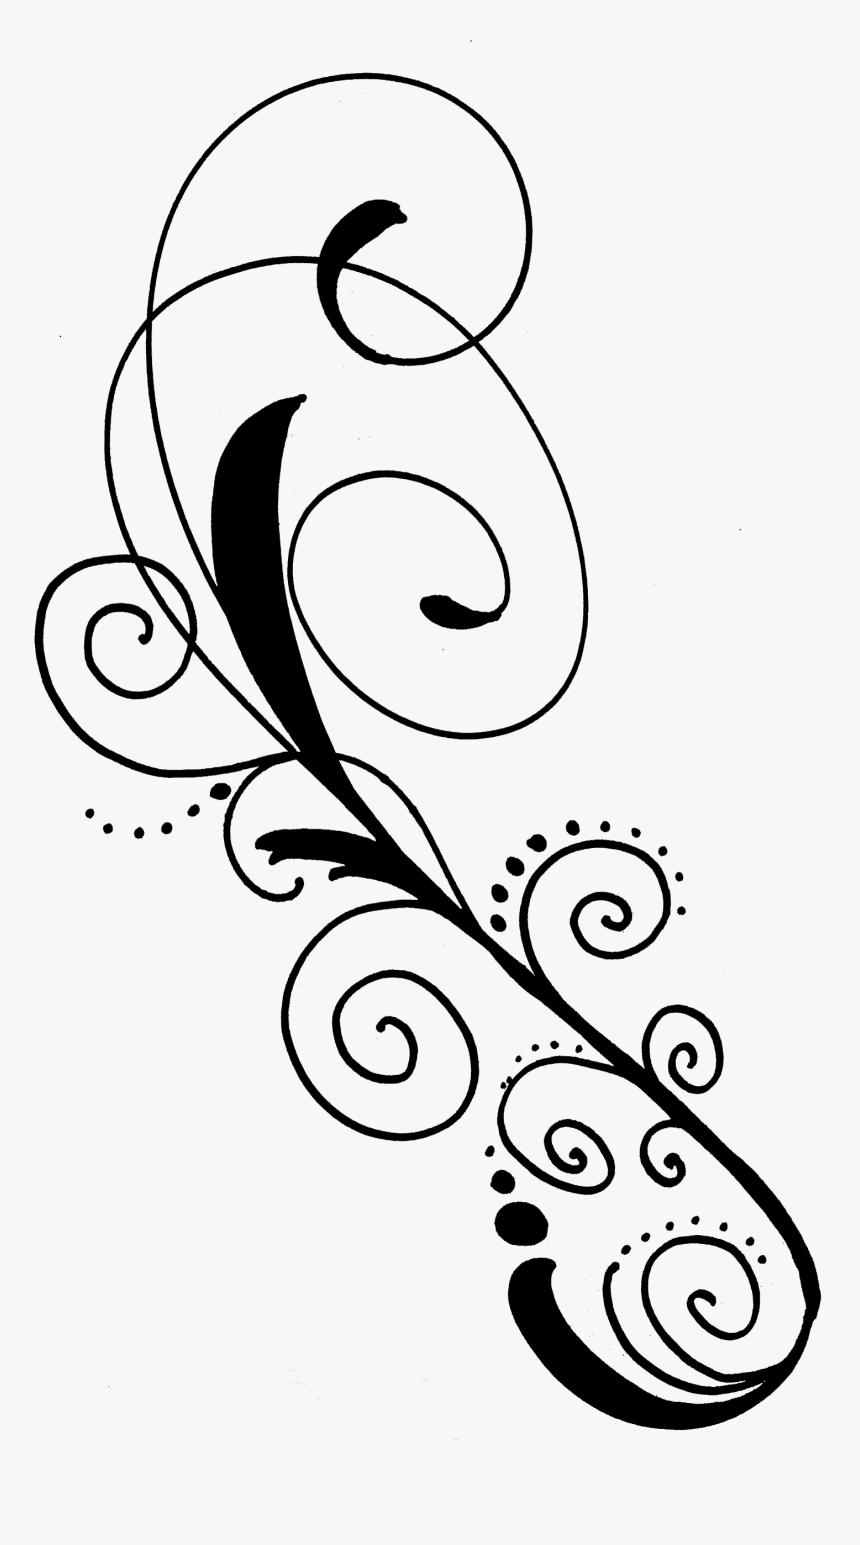 Black Teal Swirl clip art | Clipart Panda - Free Clipart Images